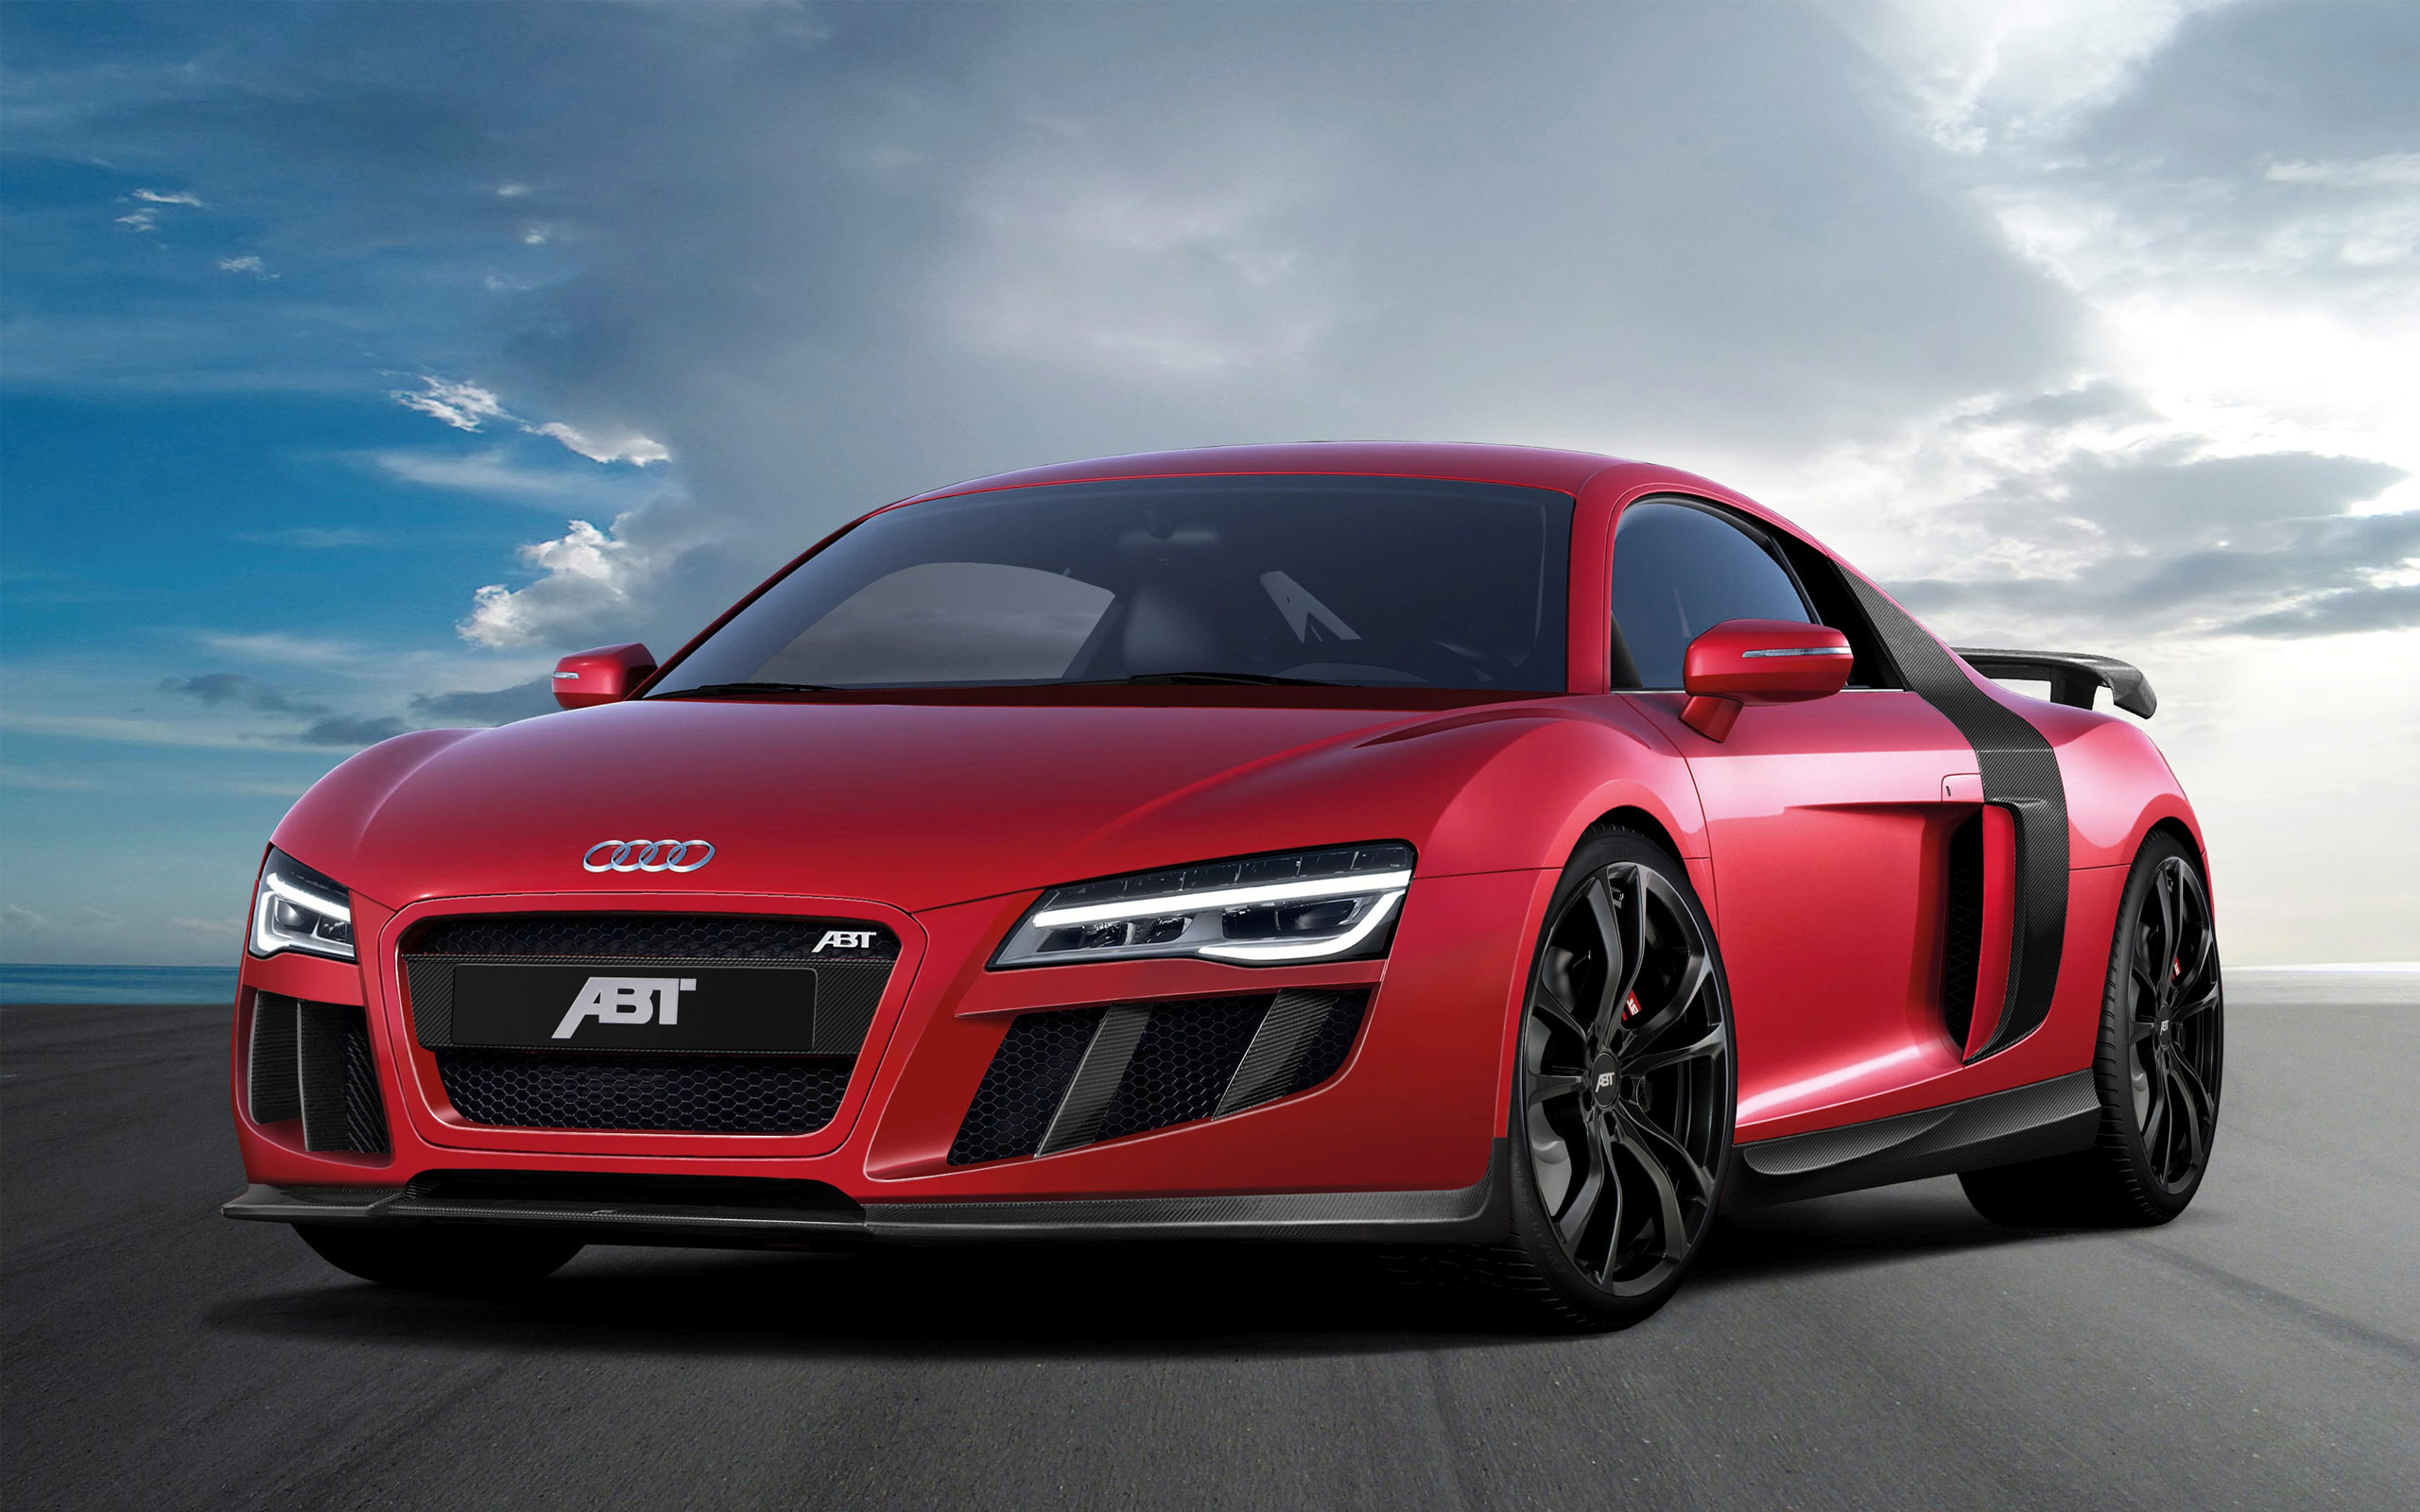 Audi R8 V10 by Abt Car HD Wallpaper HD Wallpapers 2560x1600